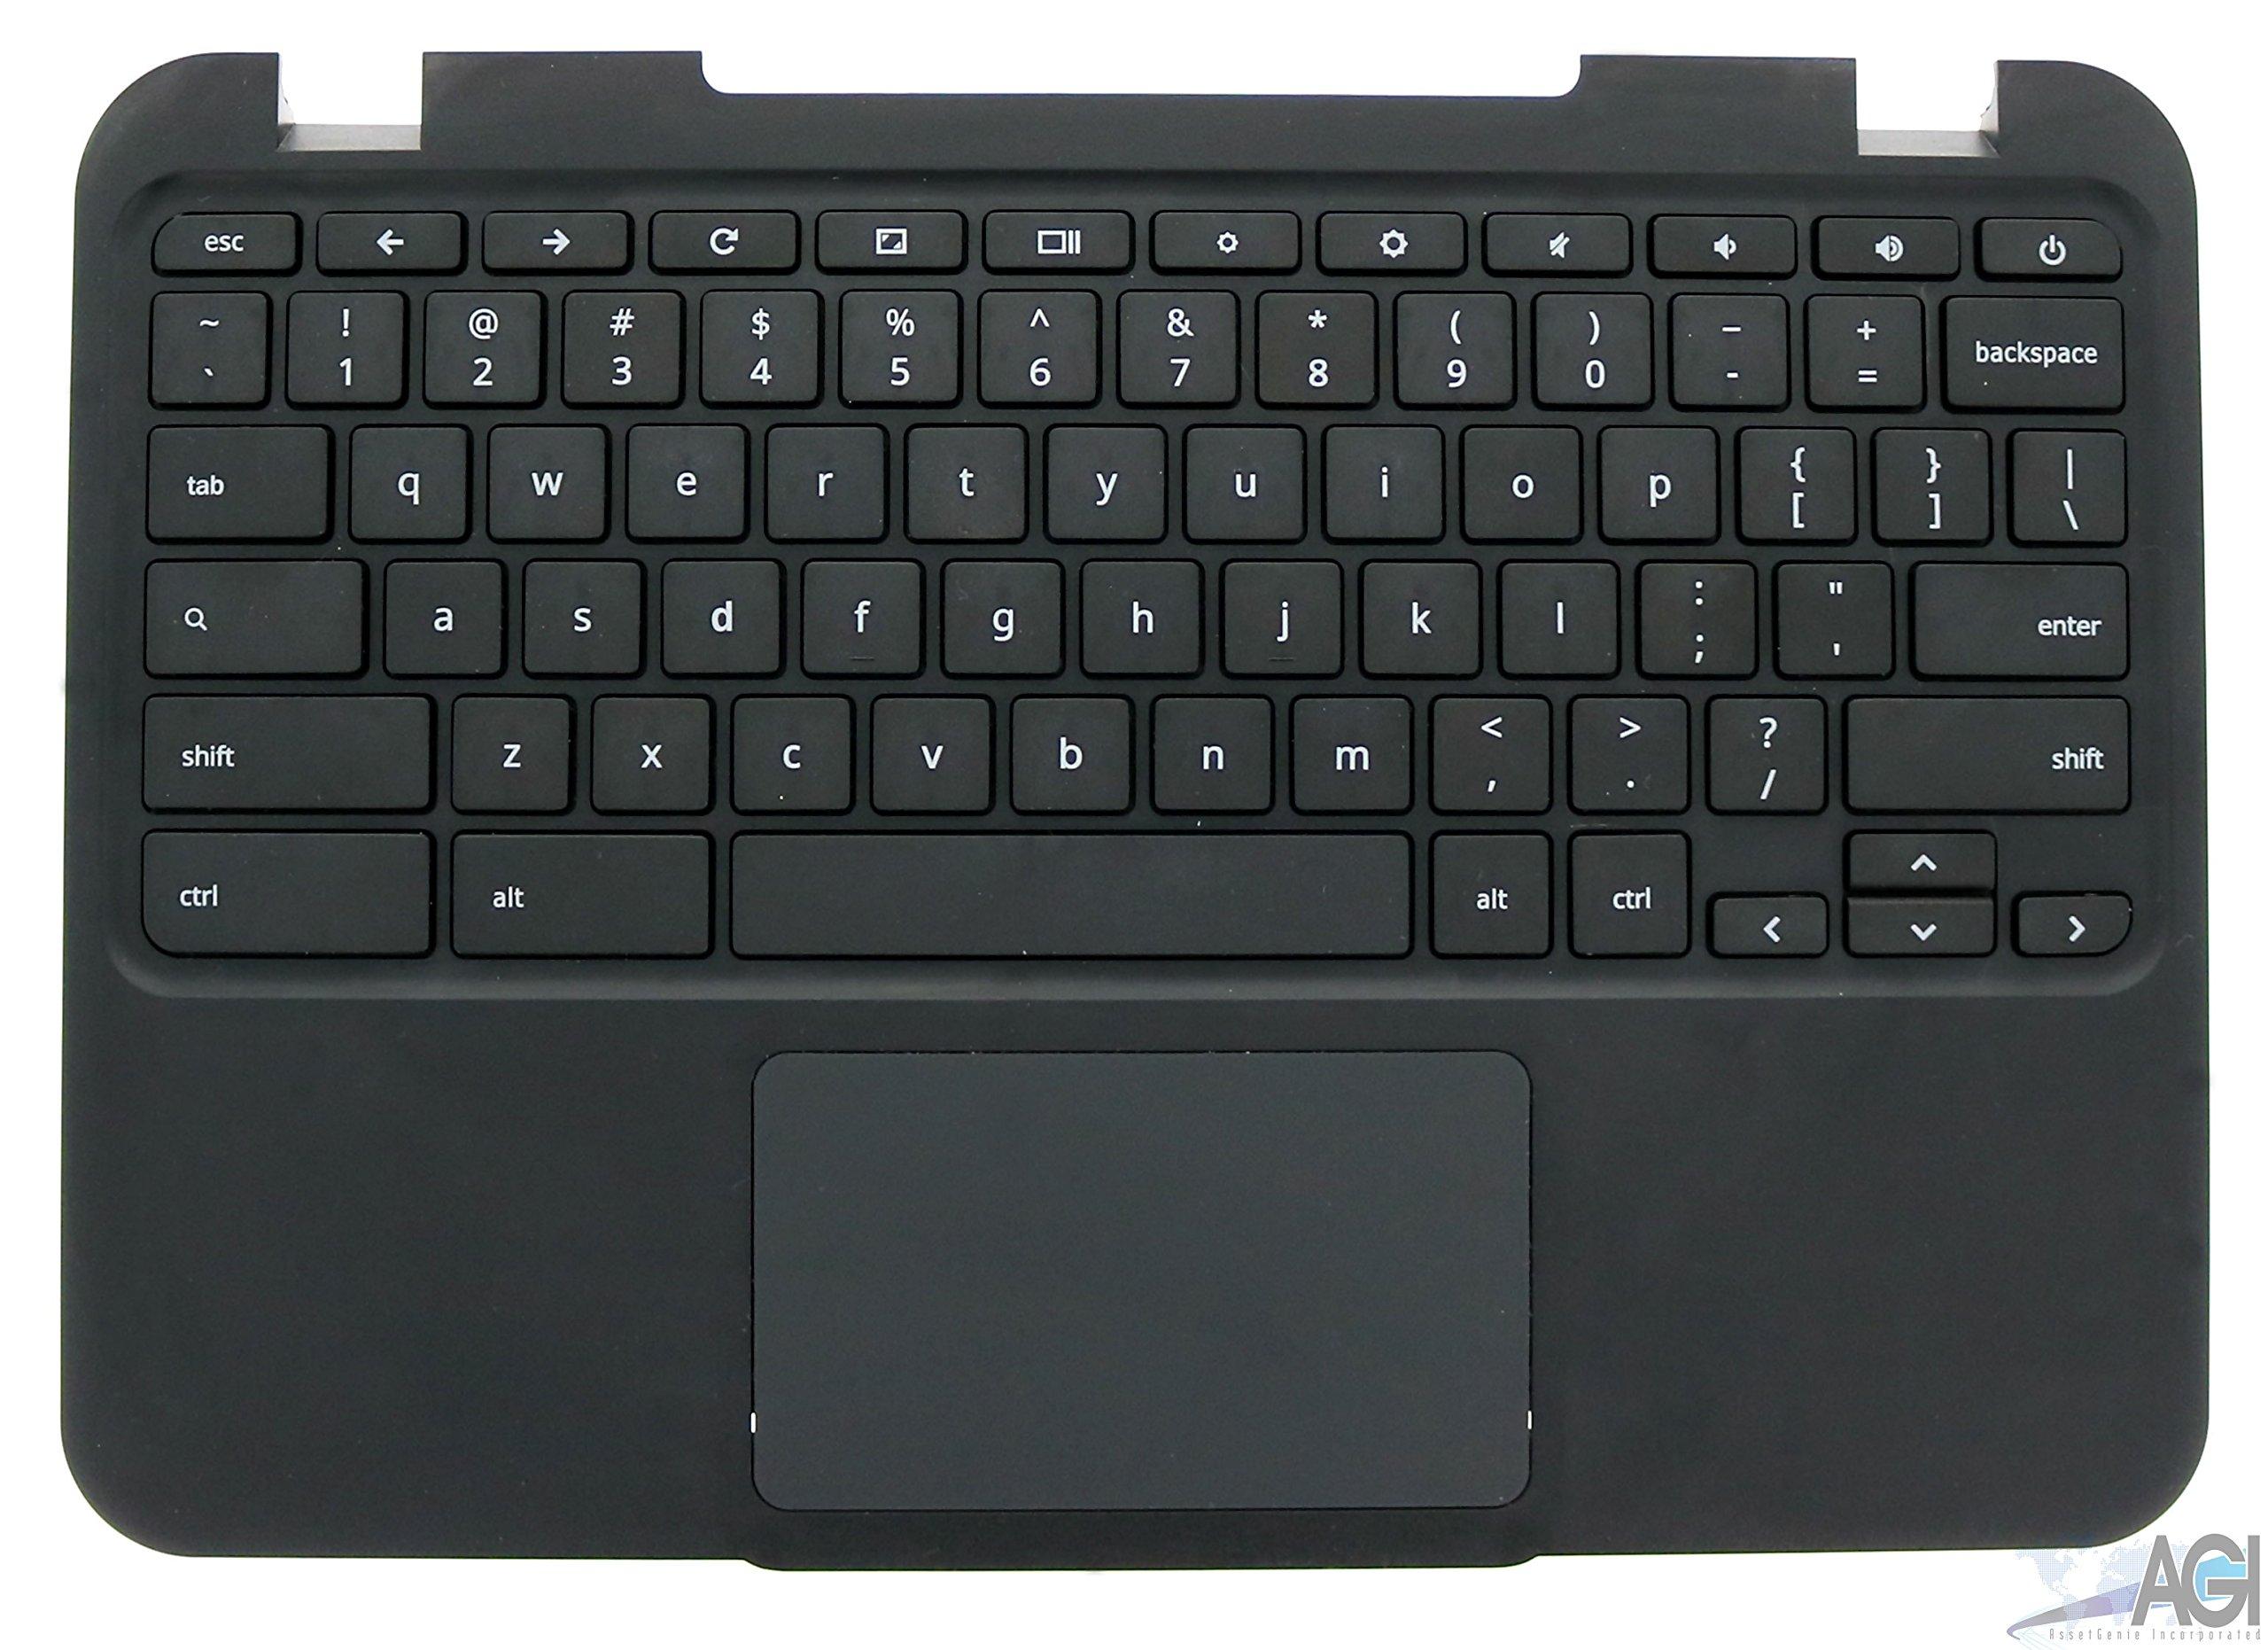 Lenovo N21 Chromebook Keyboard Palmrest Assembly - Lenovo Part # 37NL6TC0040